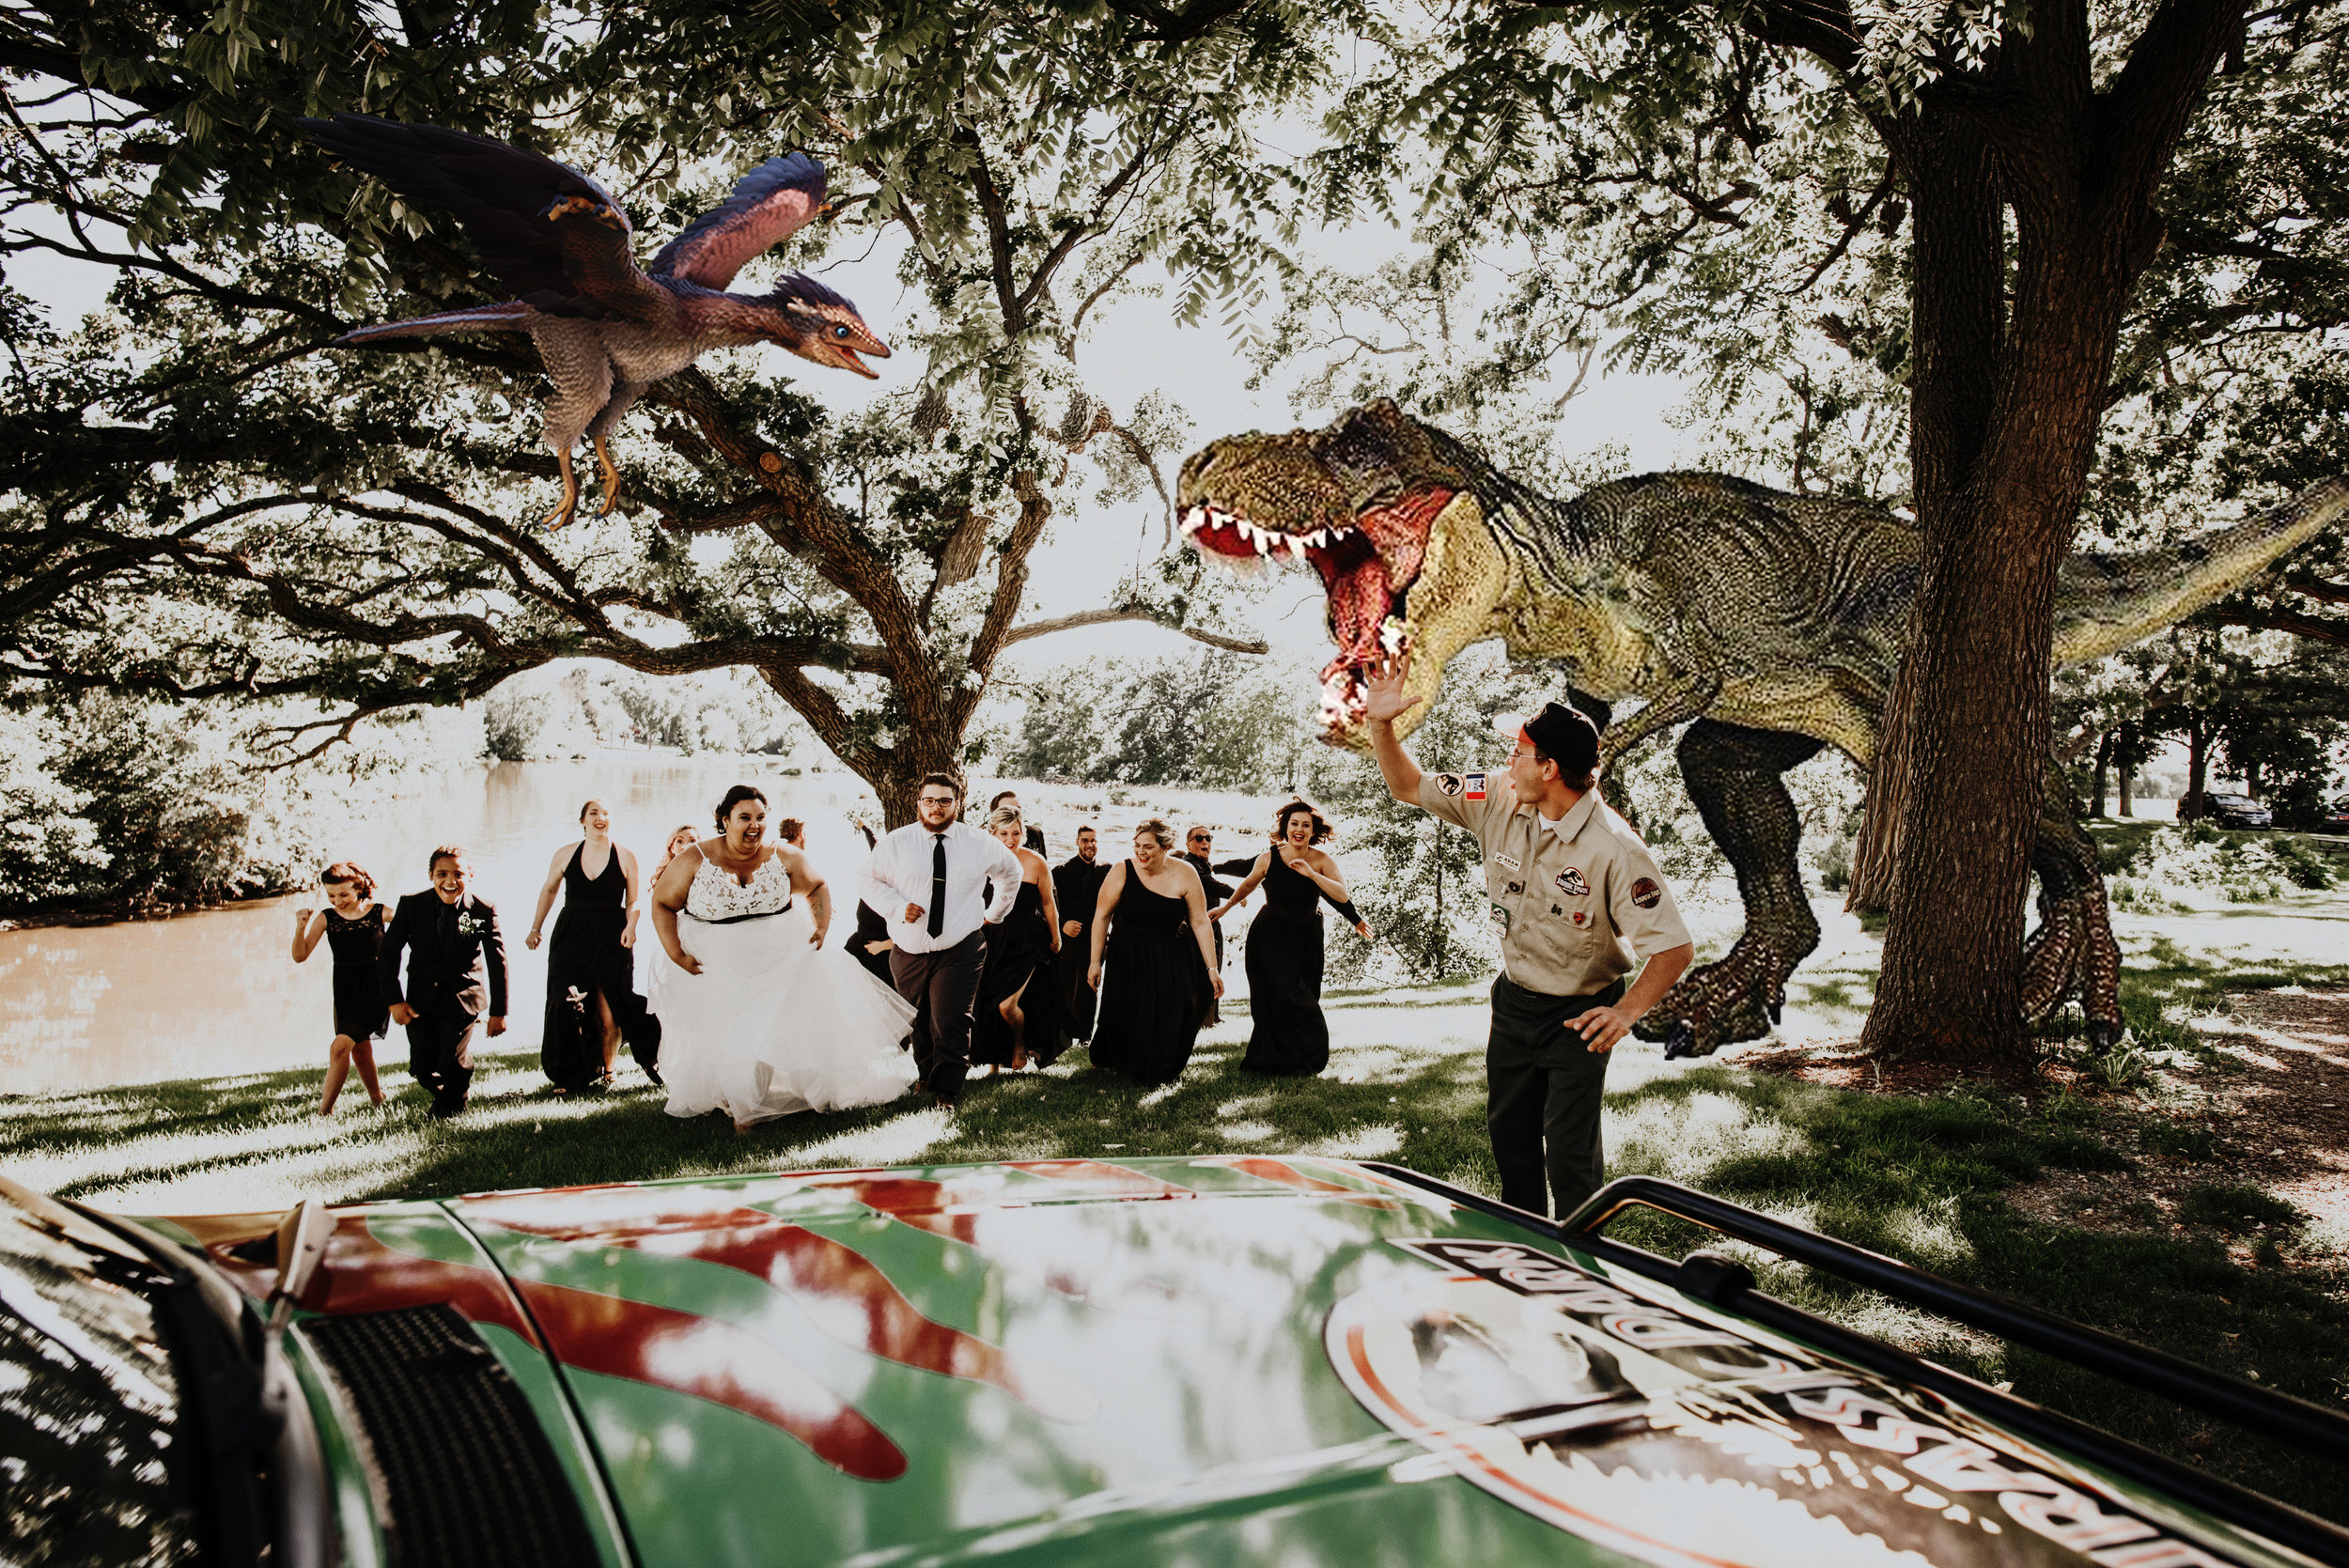 BridesbyYoung-RealWedding-PlusSizeBridal-BillyCourtney-JurassicParkTheme-36.jpg